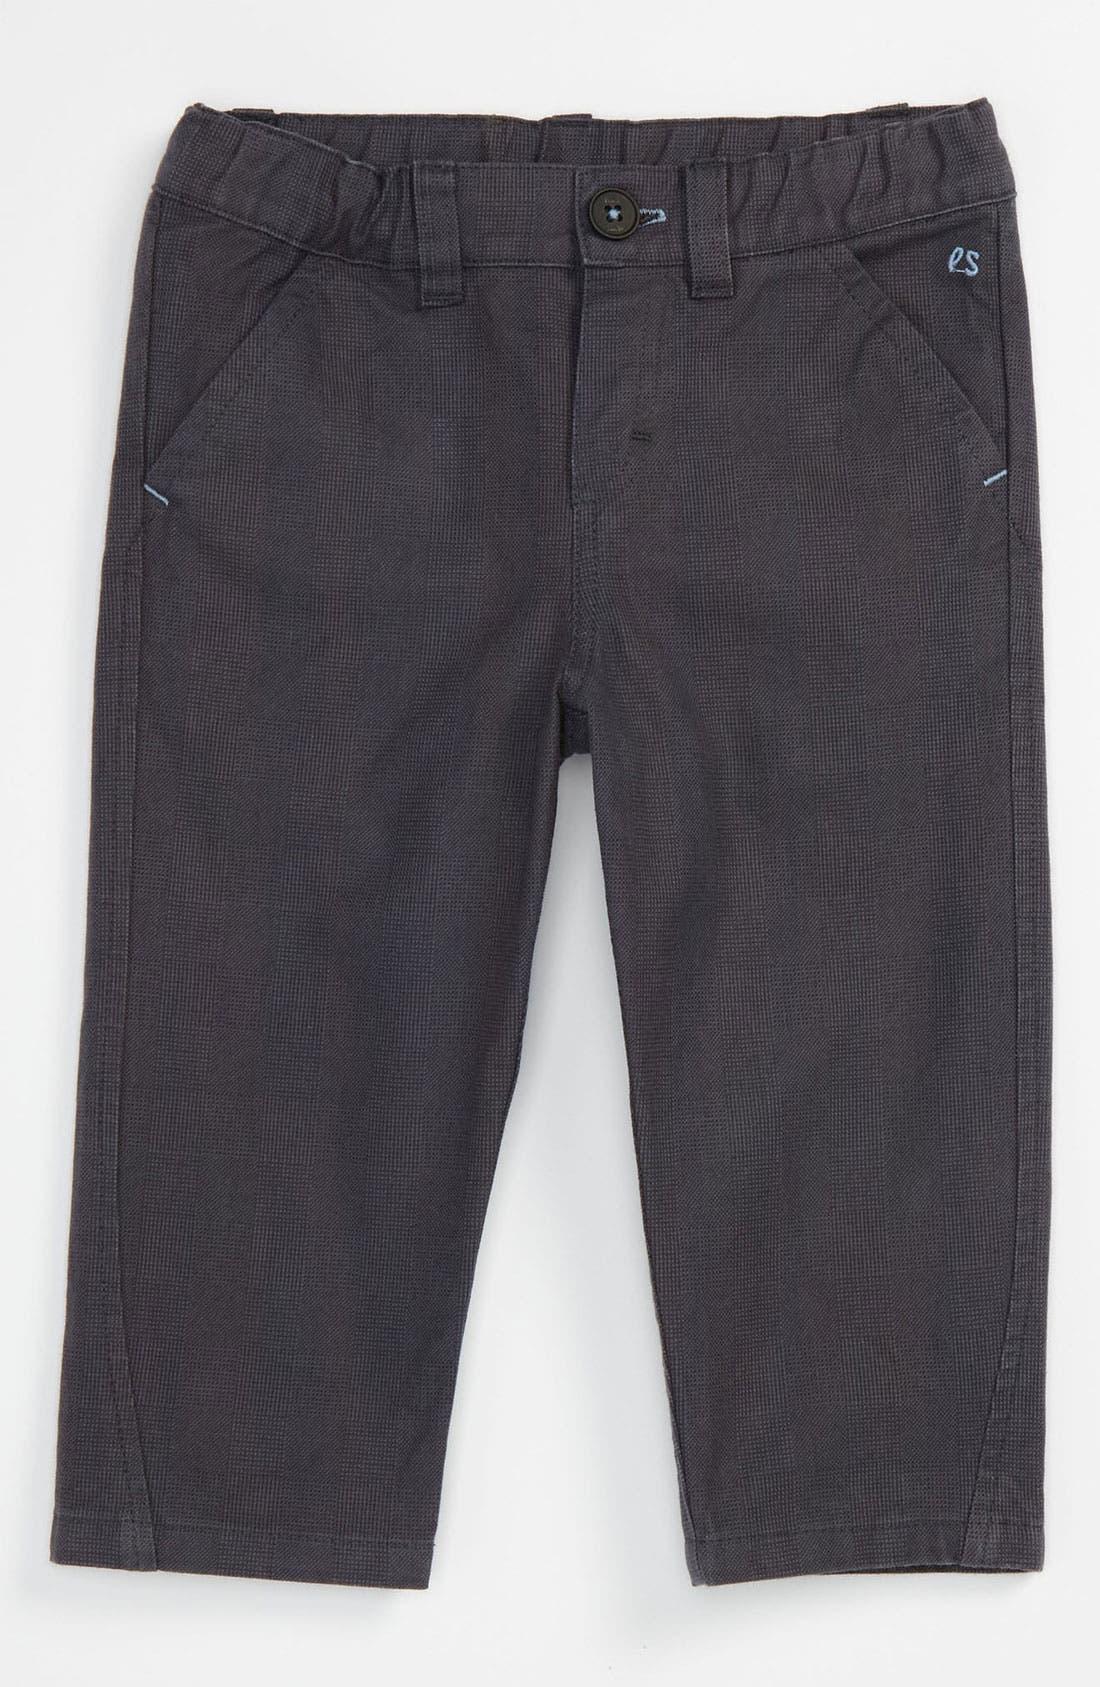 Alternate Image 1 Selected - Paul Smith Junior 'Cooper' Pants (Infant)